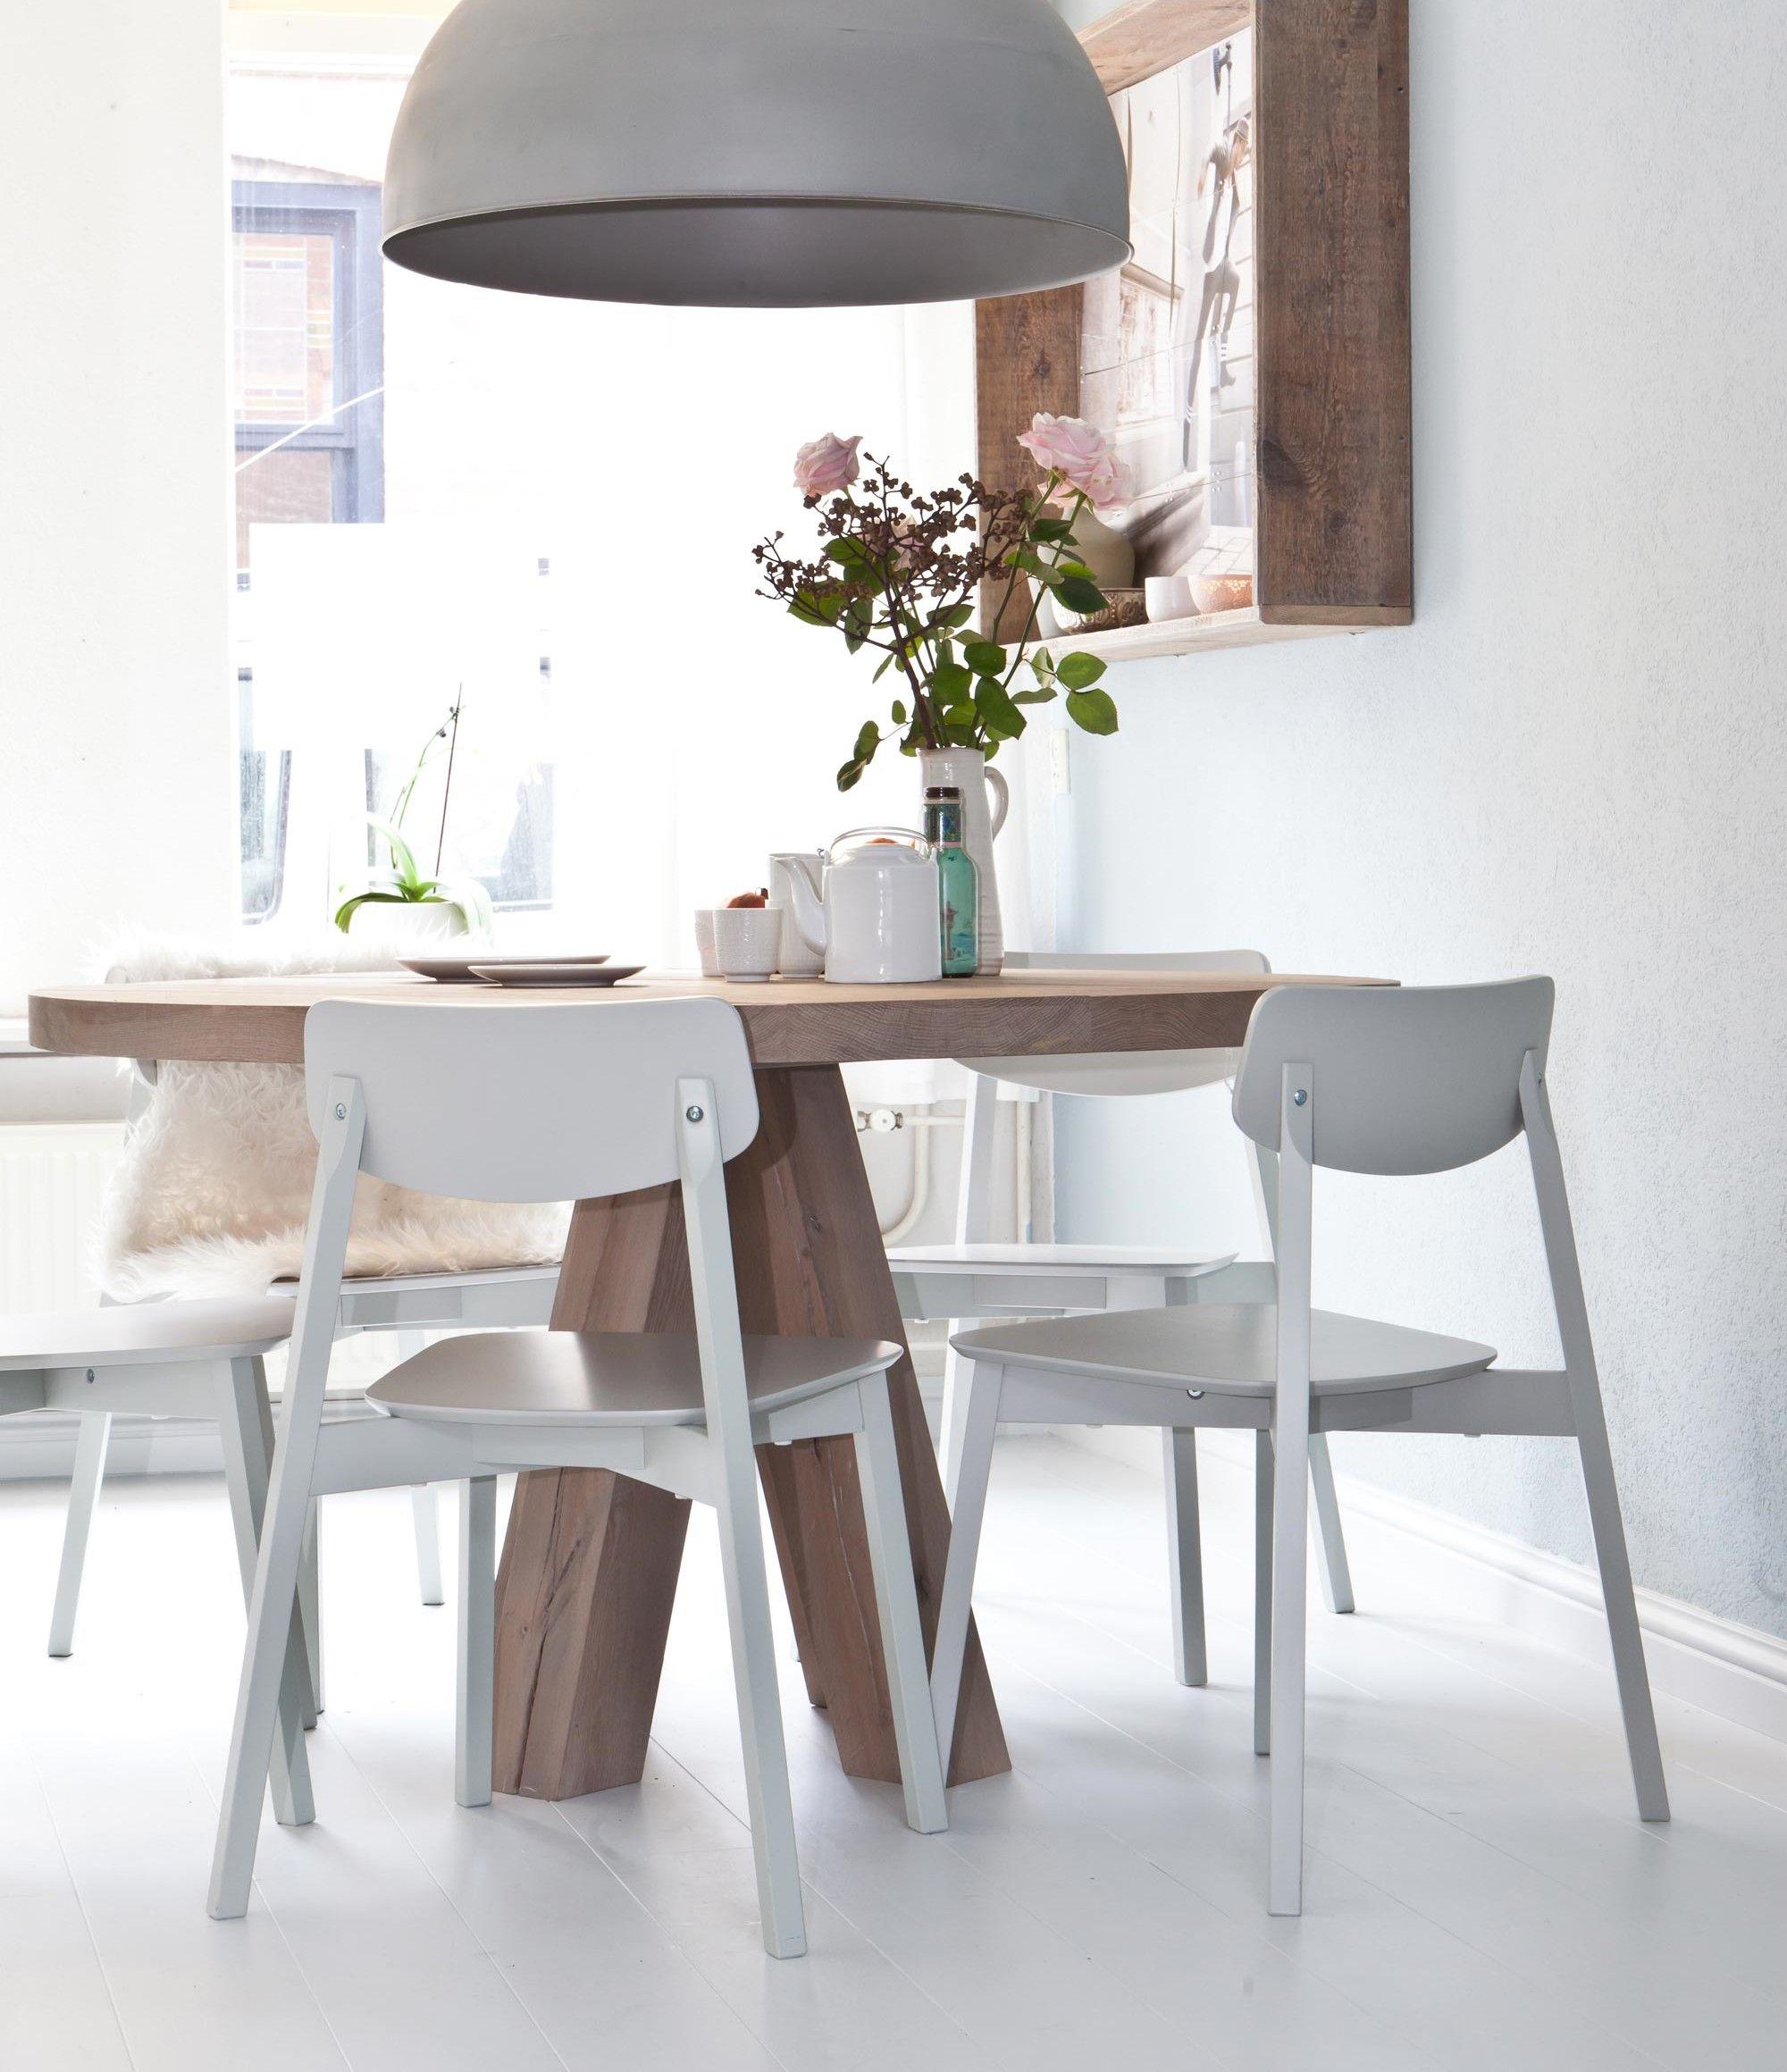 nordic style furniture. Scandinavian Style . Nordic Modern Clean Design Furniture S